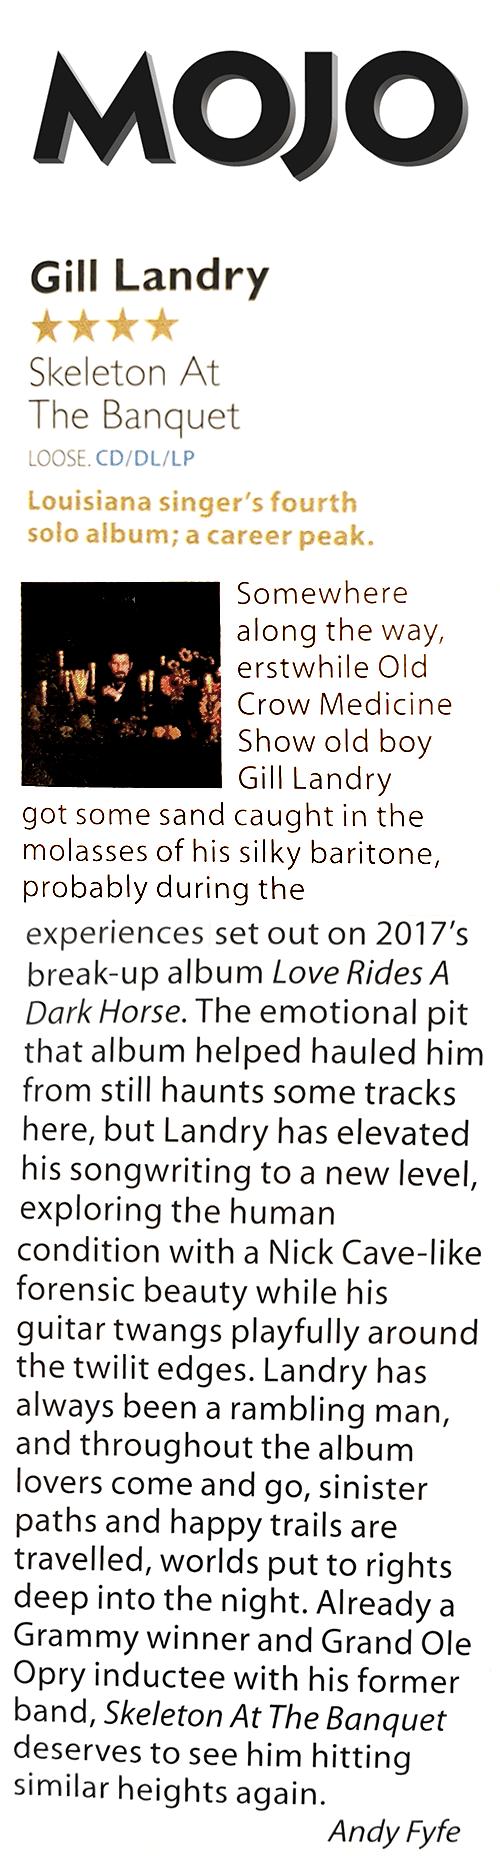 Gill Landry, MOJO, March 2020